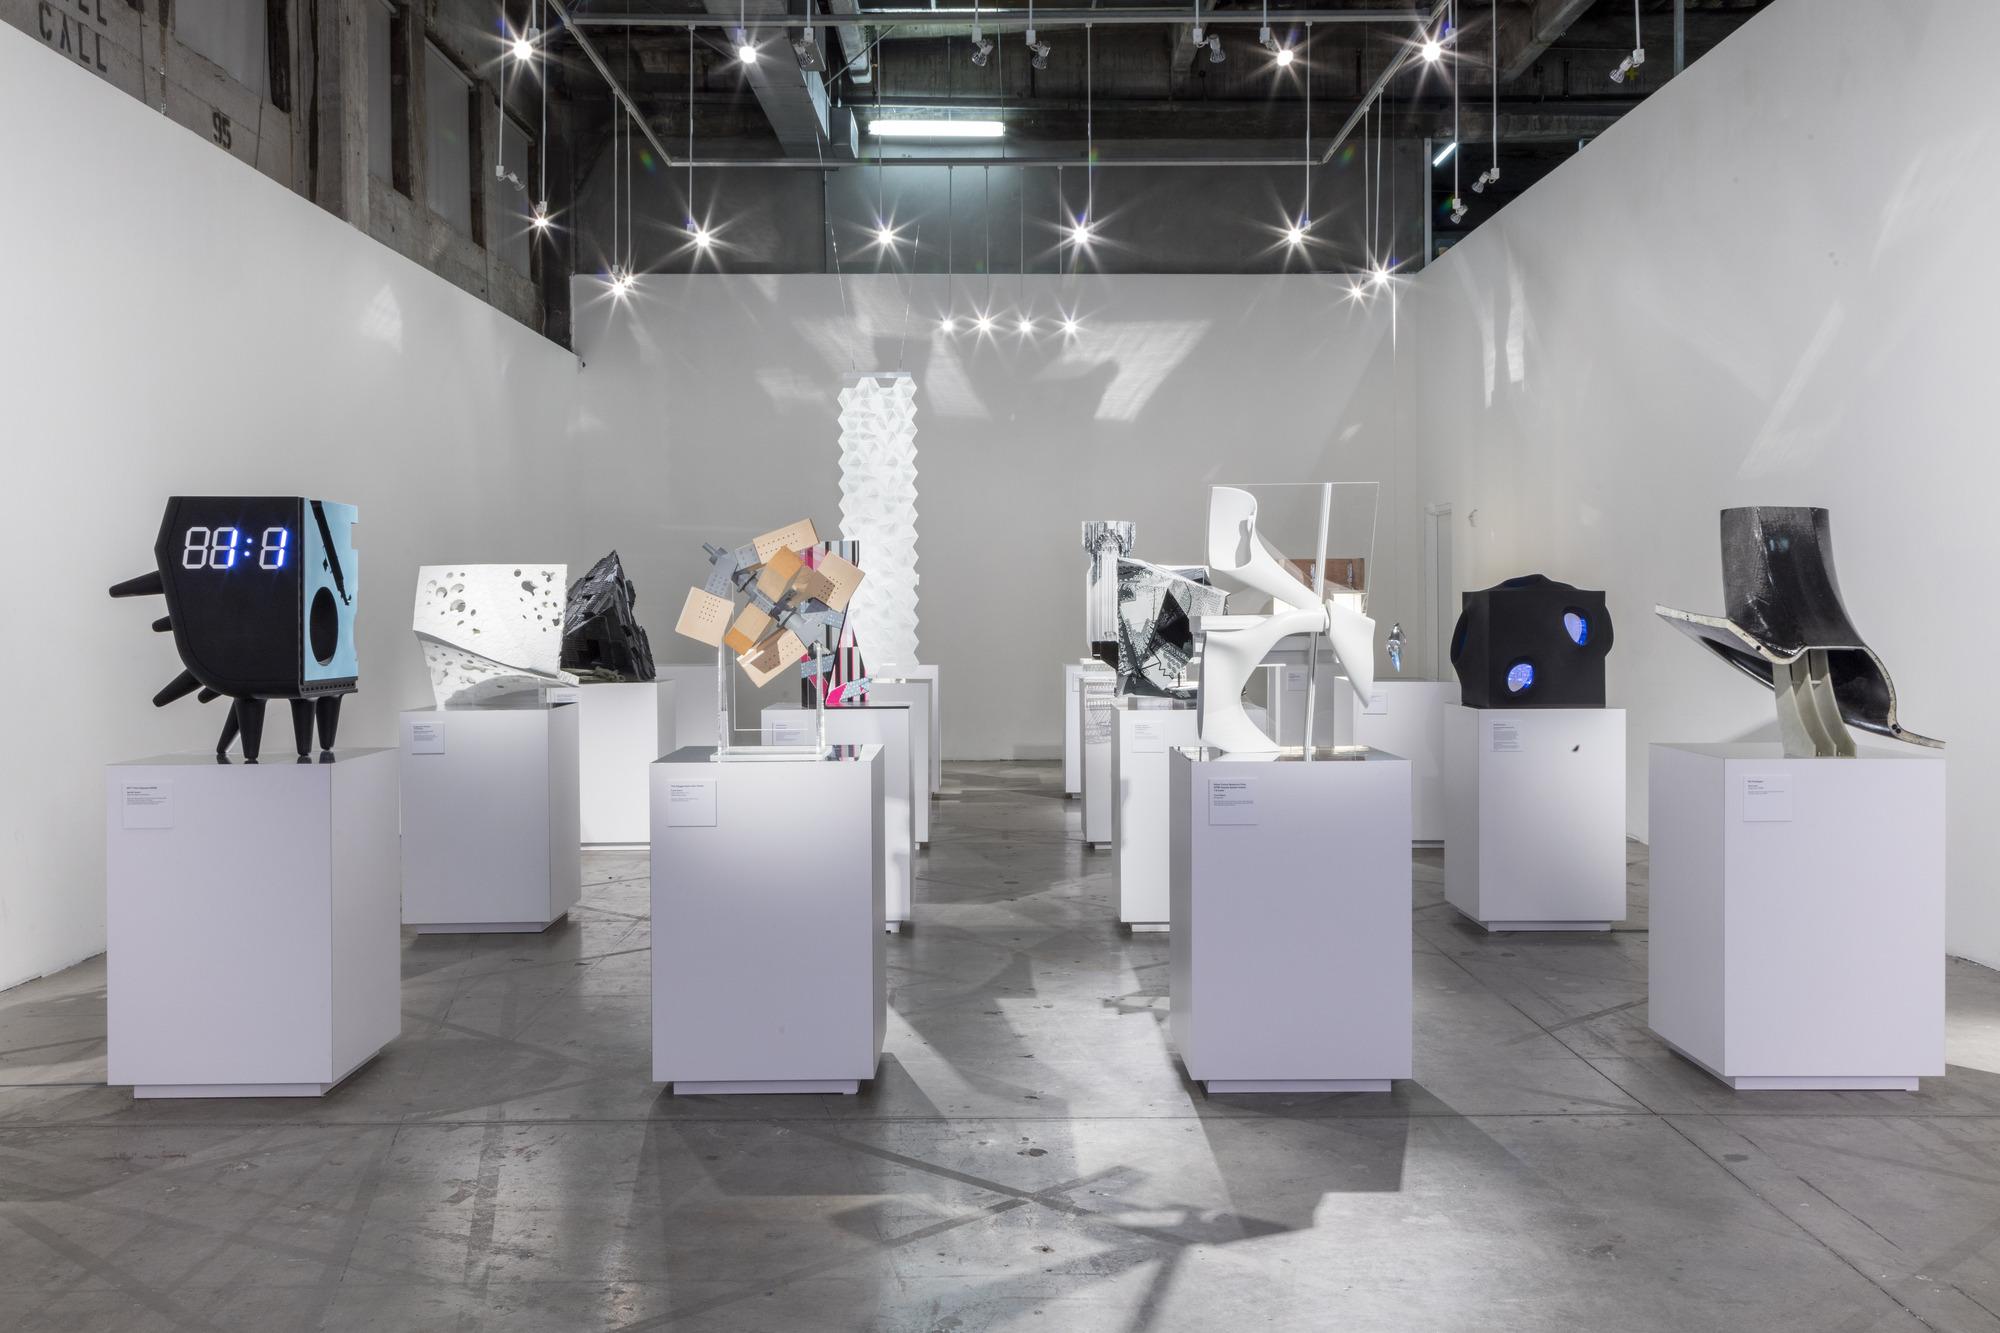 Sci-arc Close- Exhibit Explores Potential Of Digital Technologies Architectural